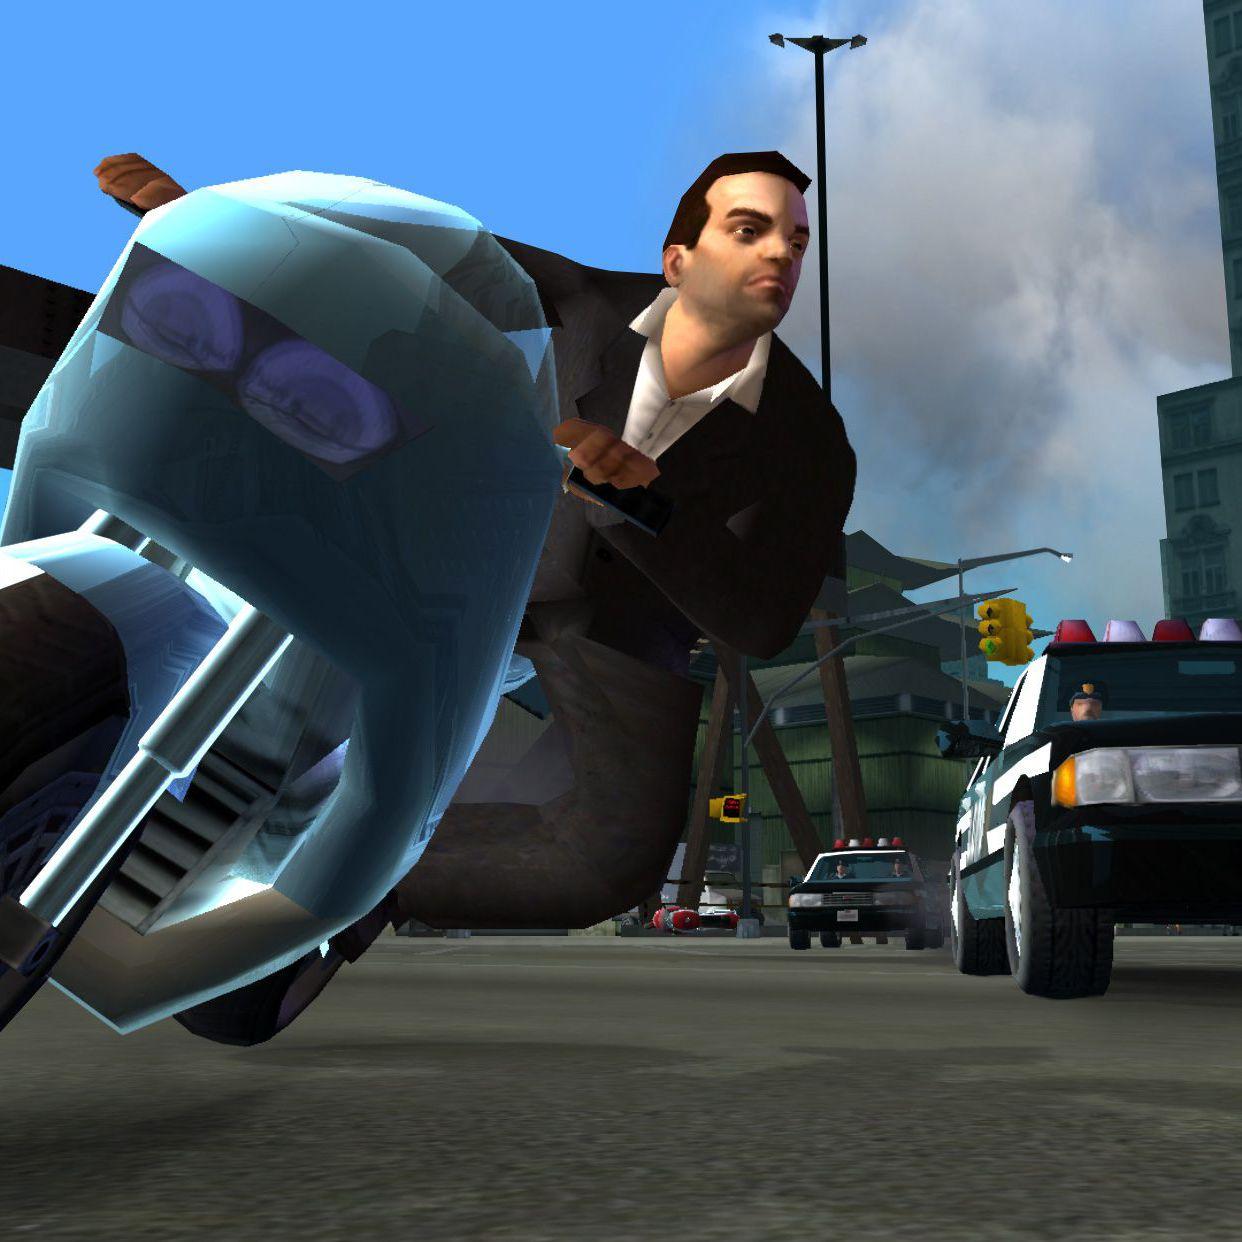 Grand Theft Auto: Liberty City Stories PSP Cheats Guide